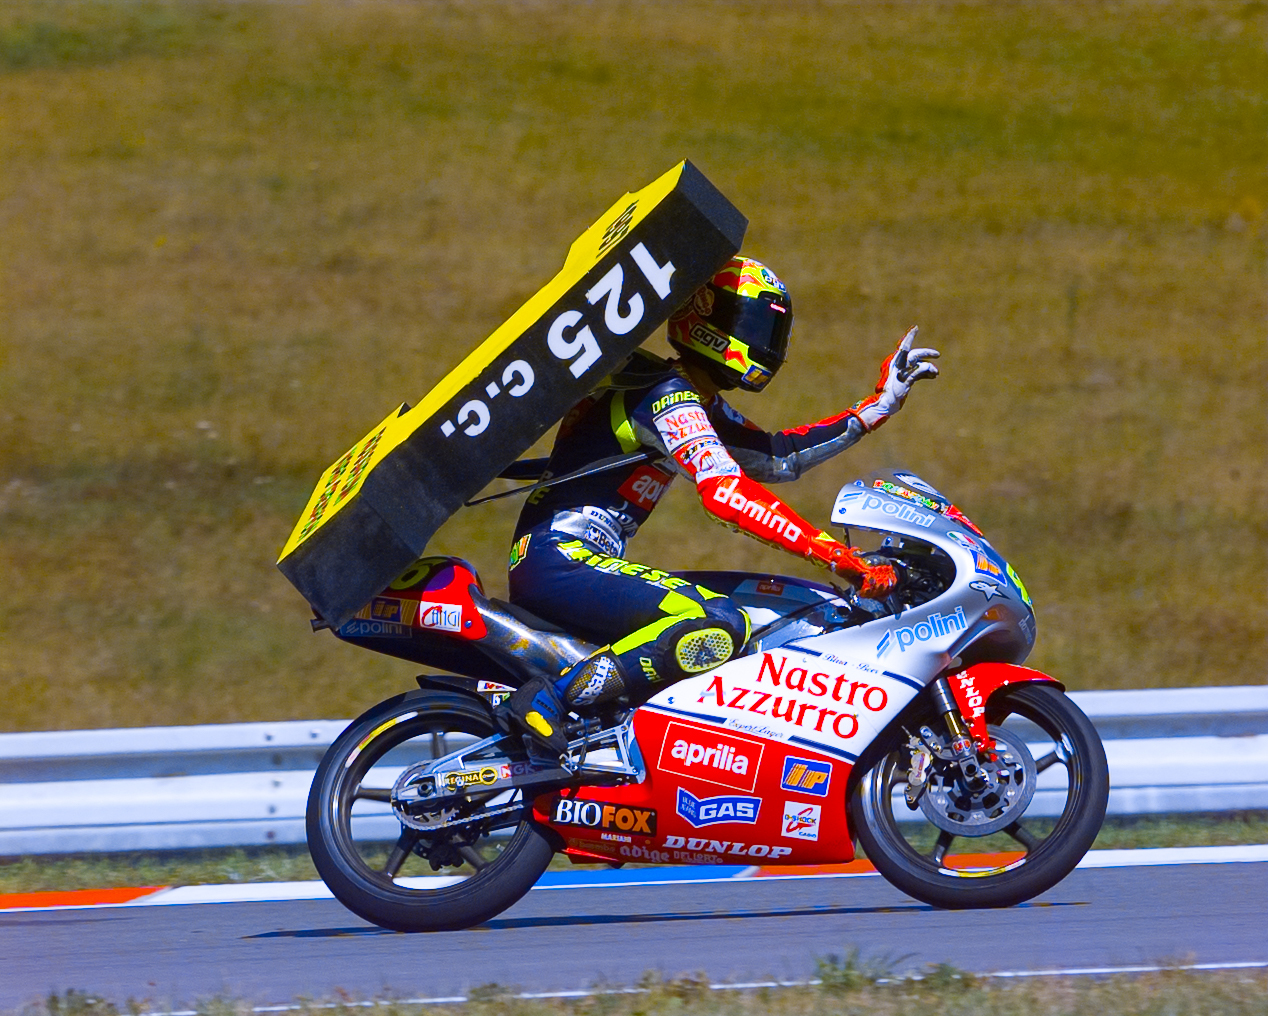 Valentino Rossi announces his retirement from Grand Prix racing